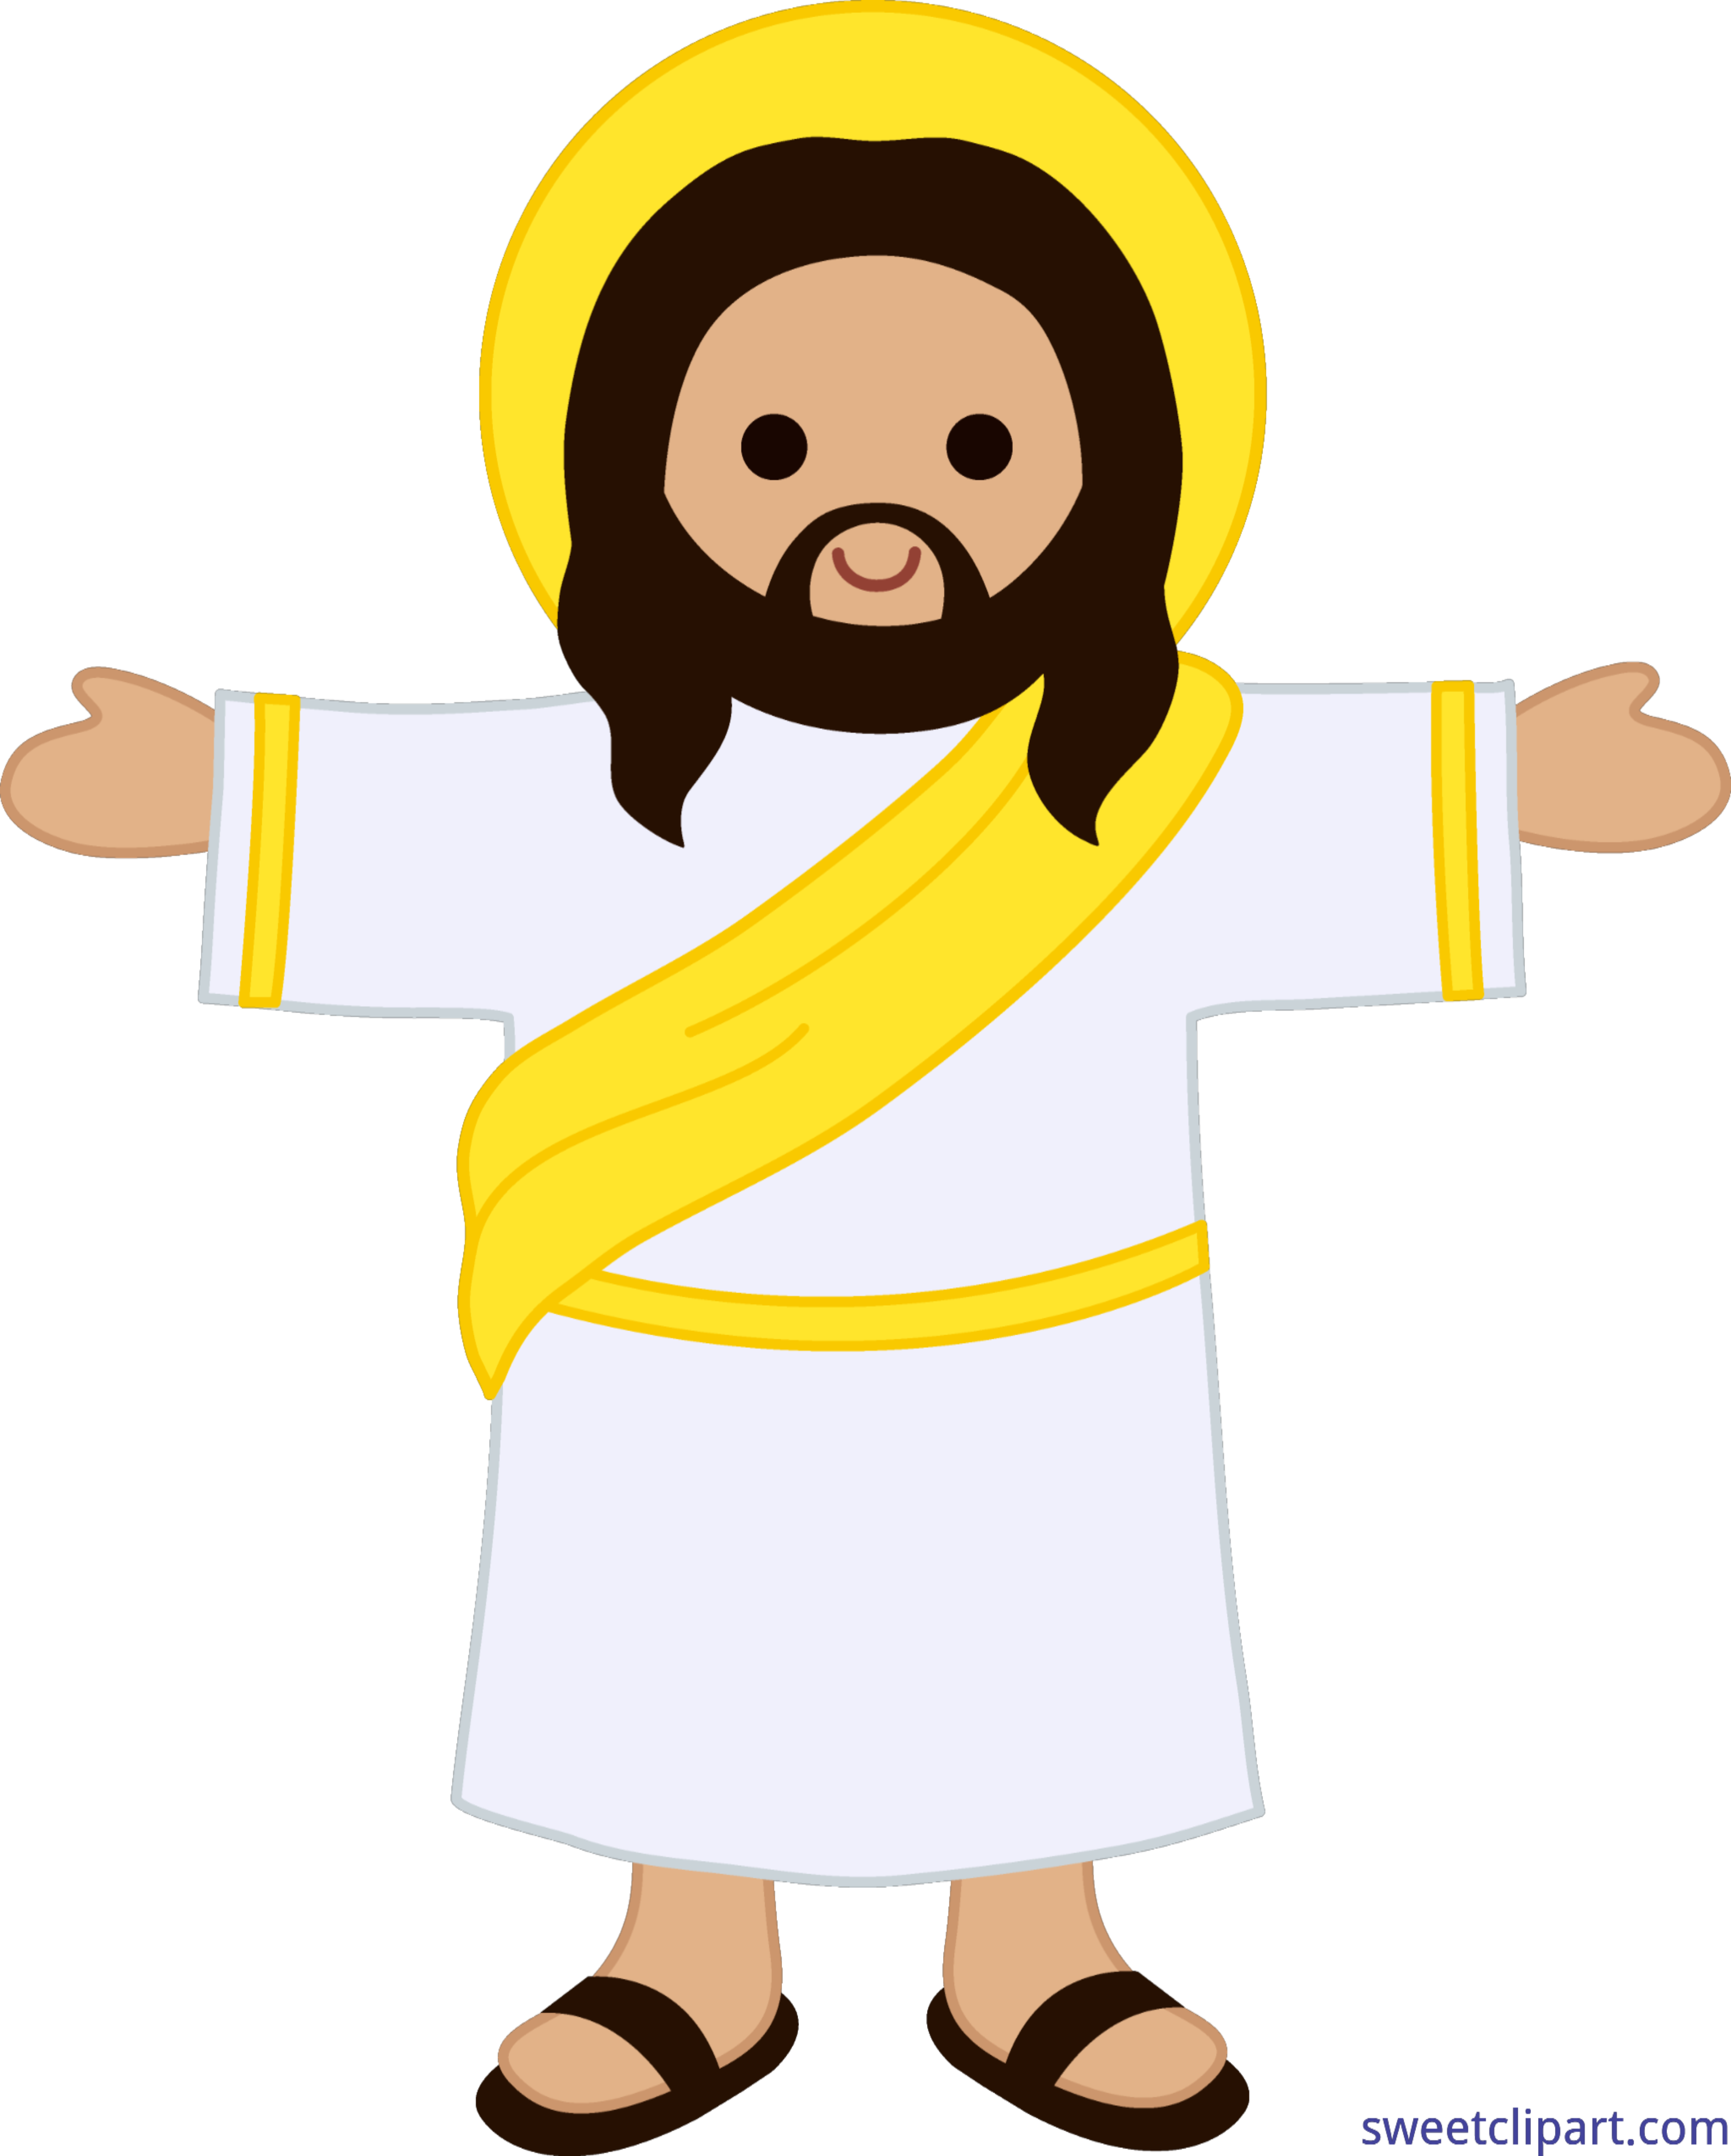 Jesus clipart lineart. Cute christ clip art